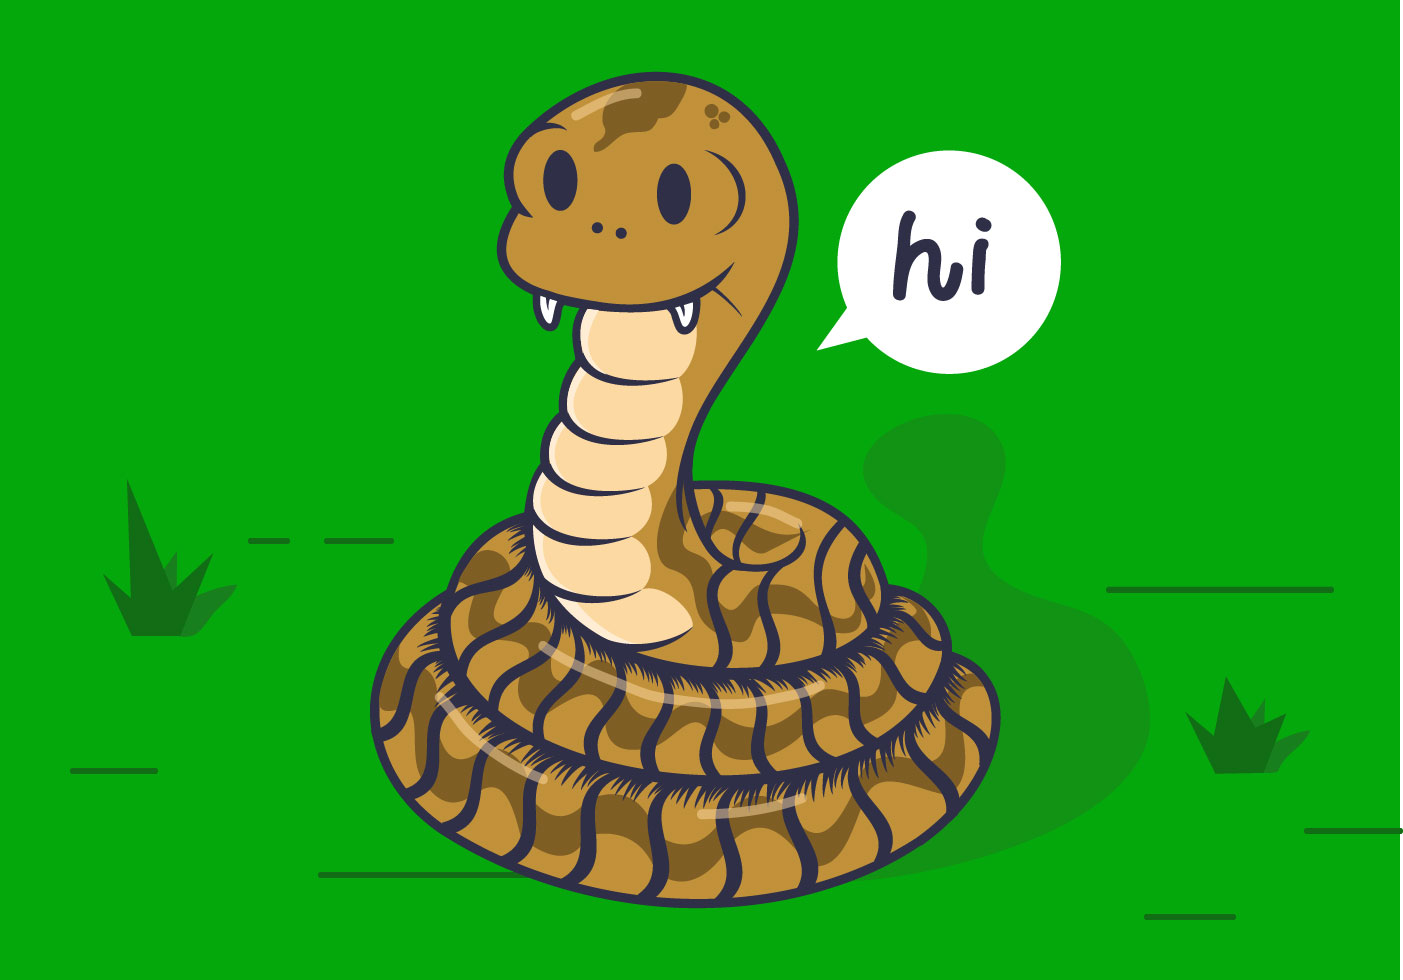 Coiled Cartoon Rattlesnake Vector - Download Free Vectors ...